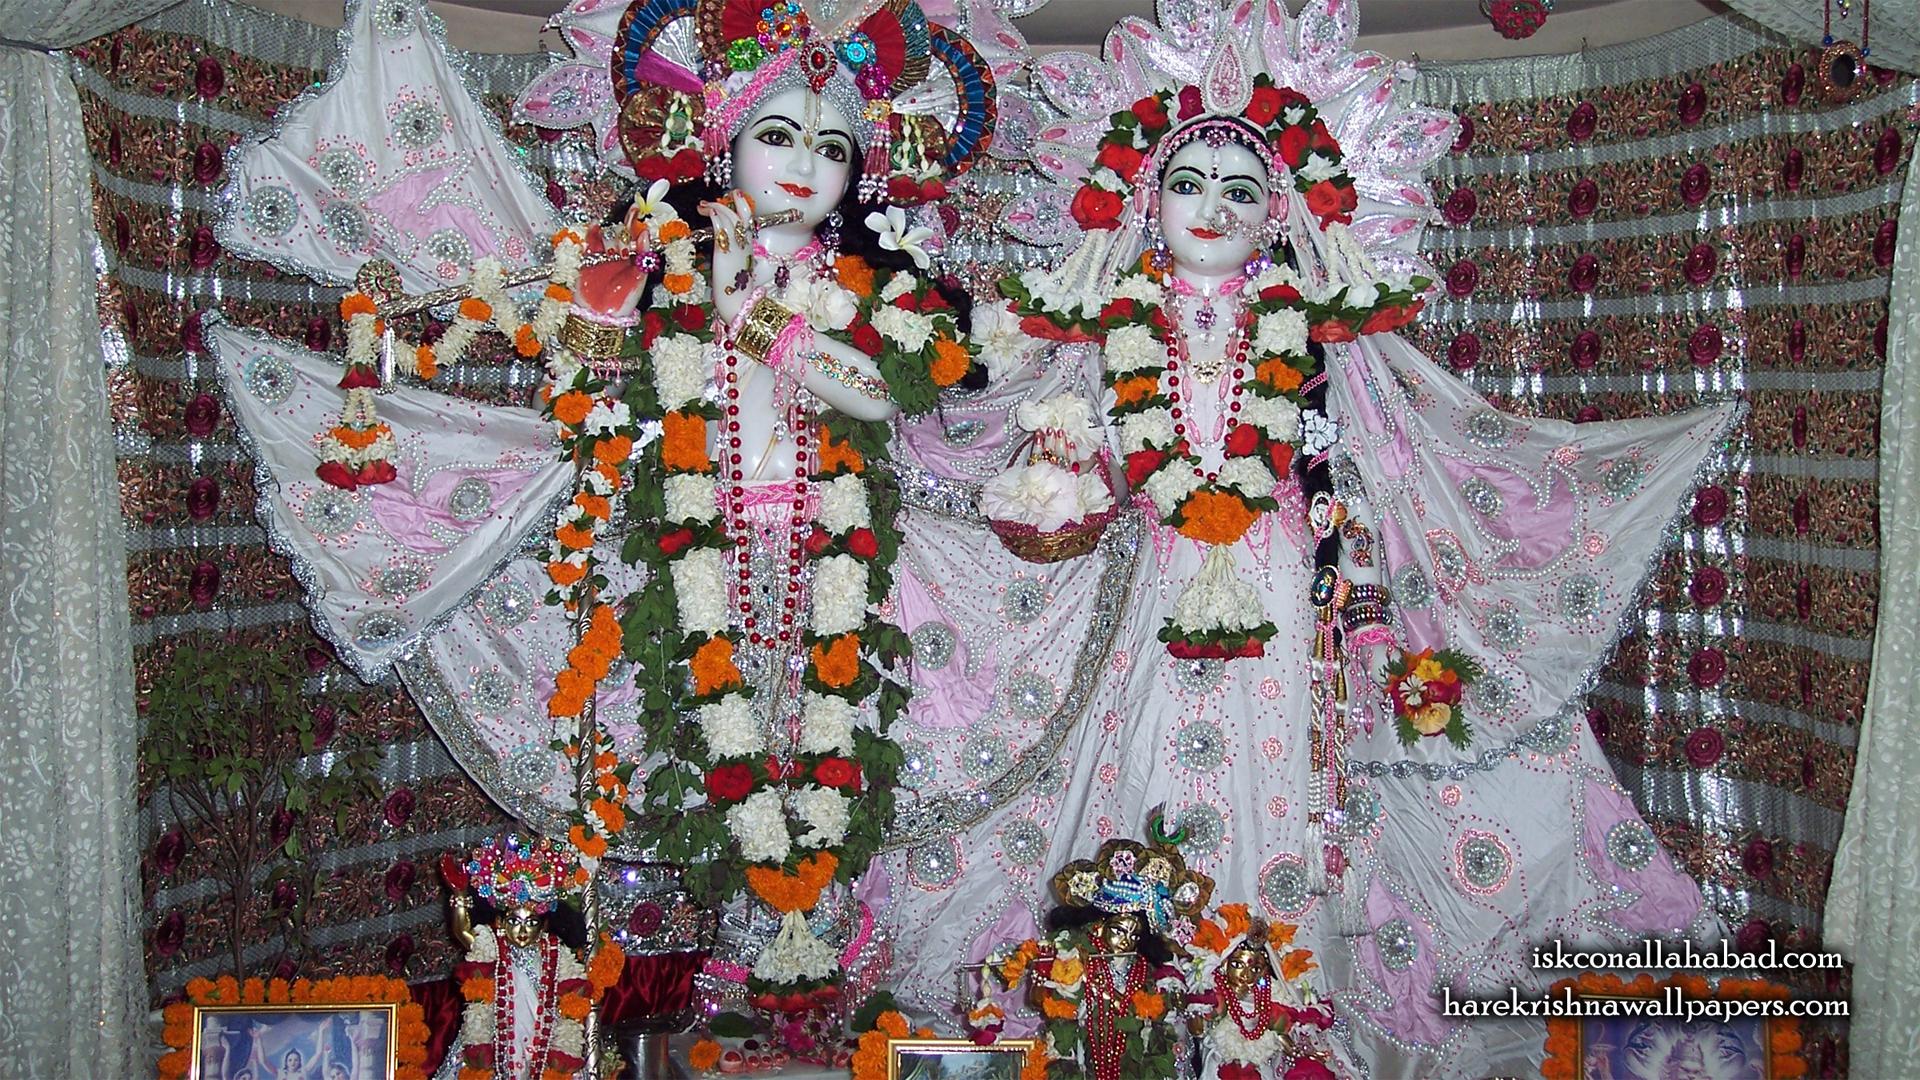 Sri Sri Radha Venimadhava Wallpaper (002) Size 1920x1080 Download